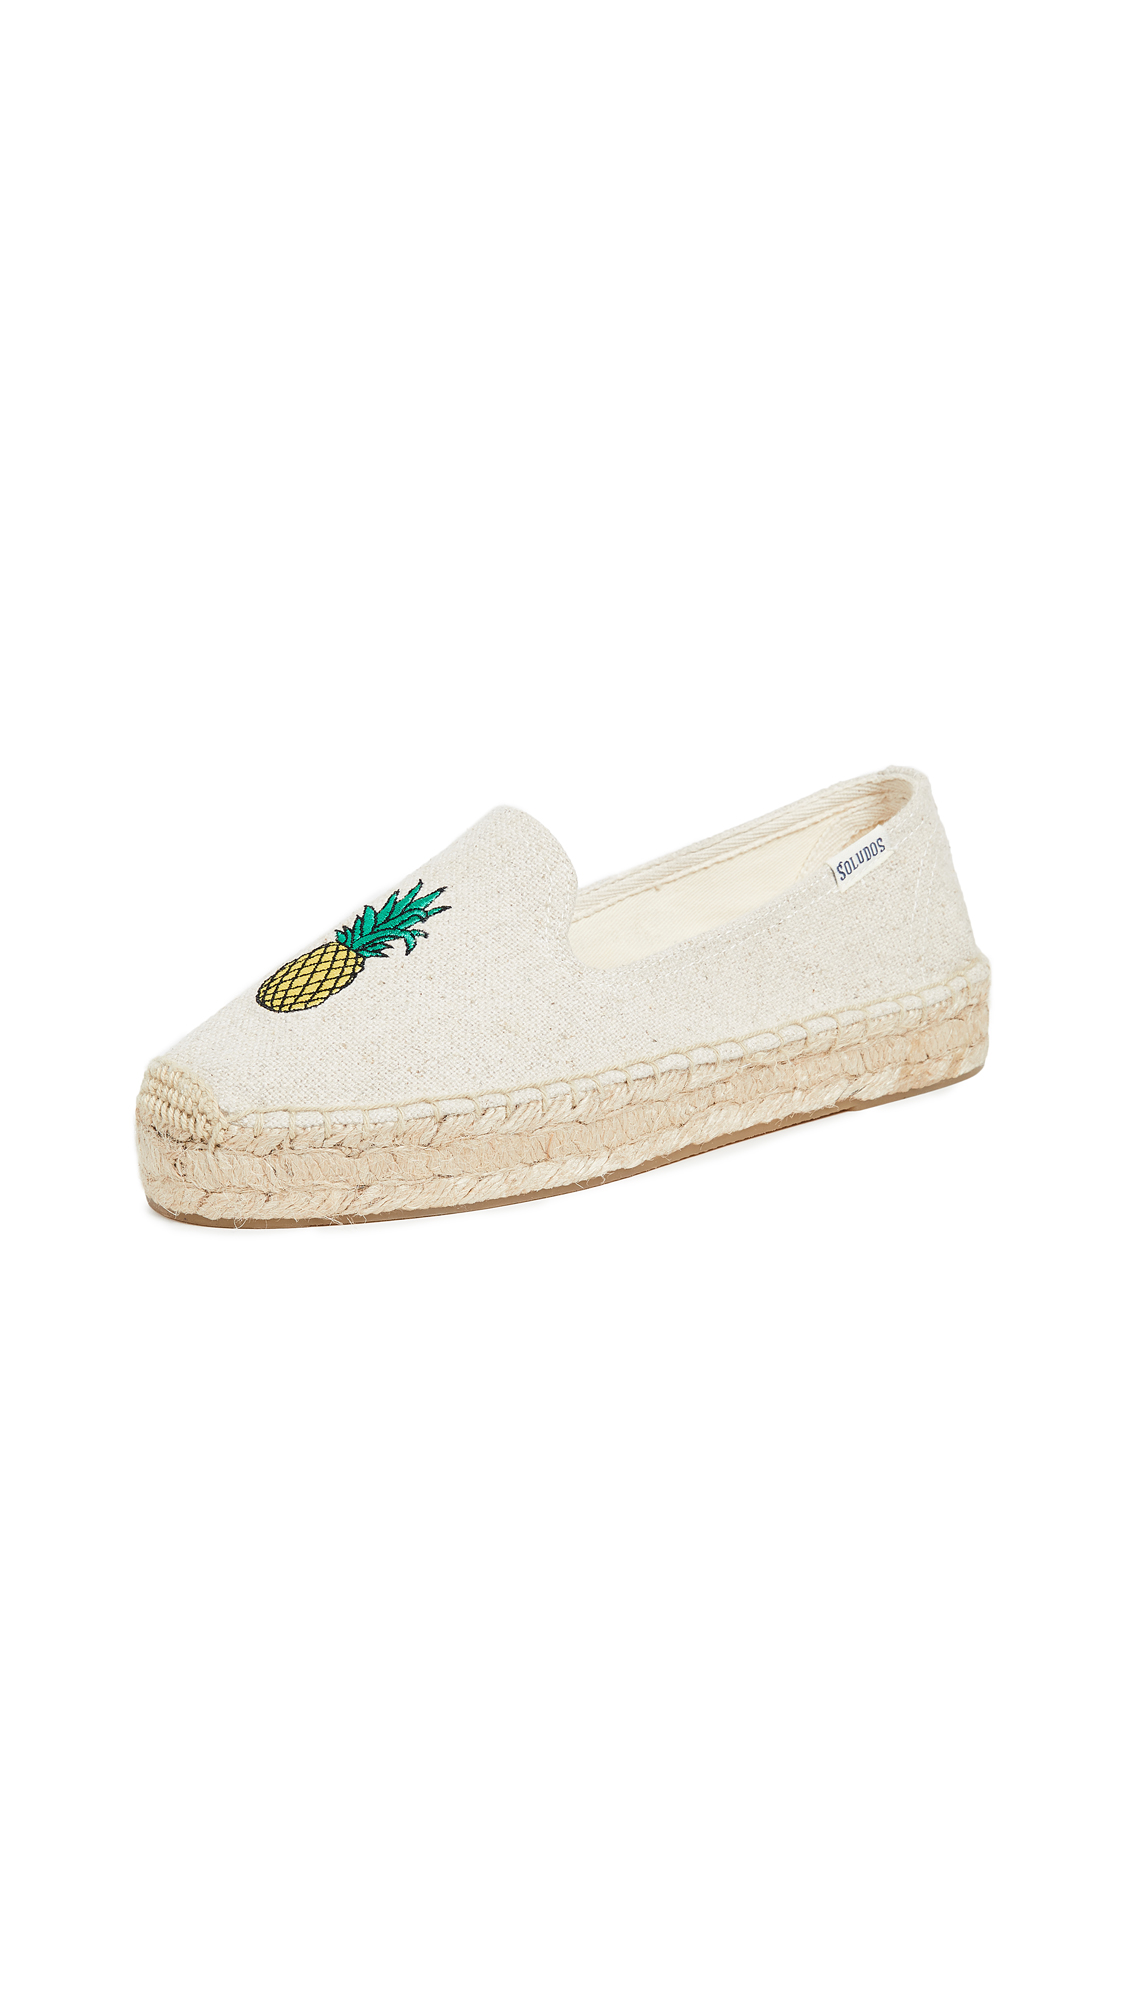 Soludos Pineapple Smoking Slippers - Sand